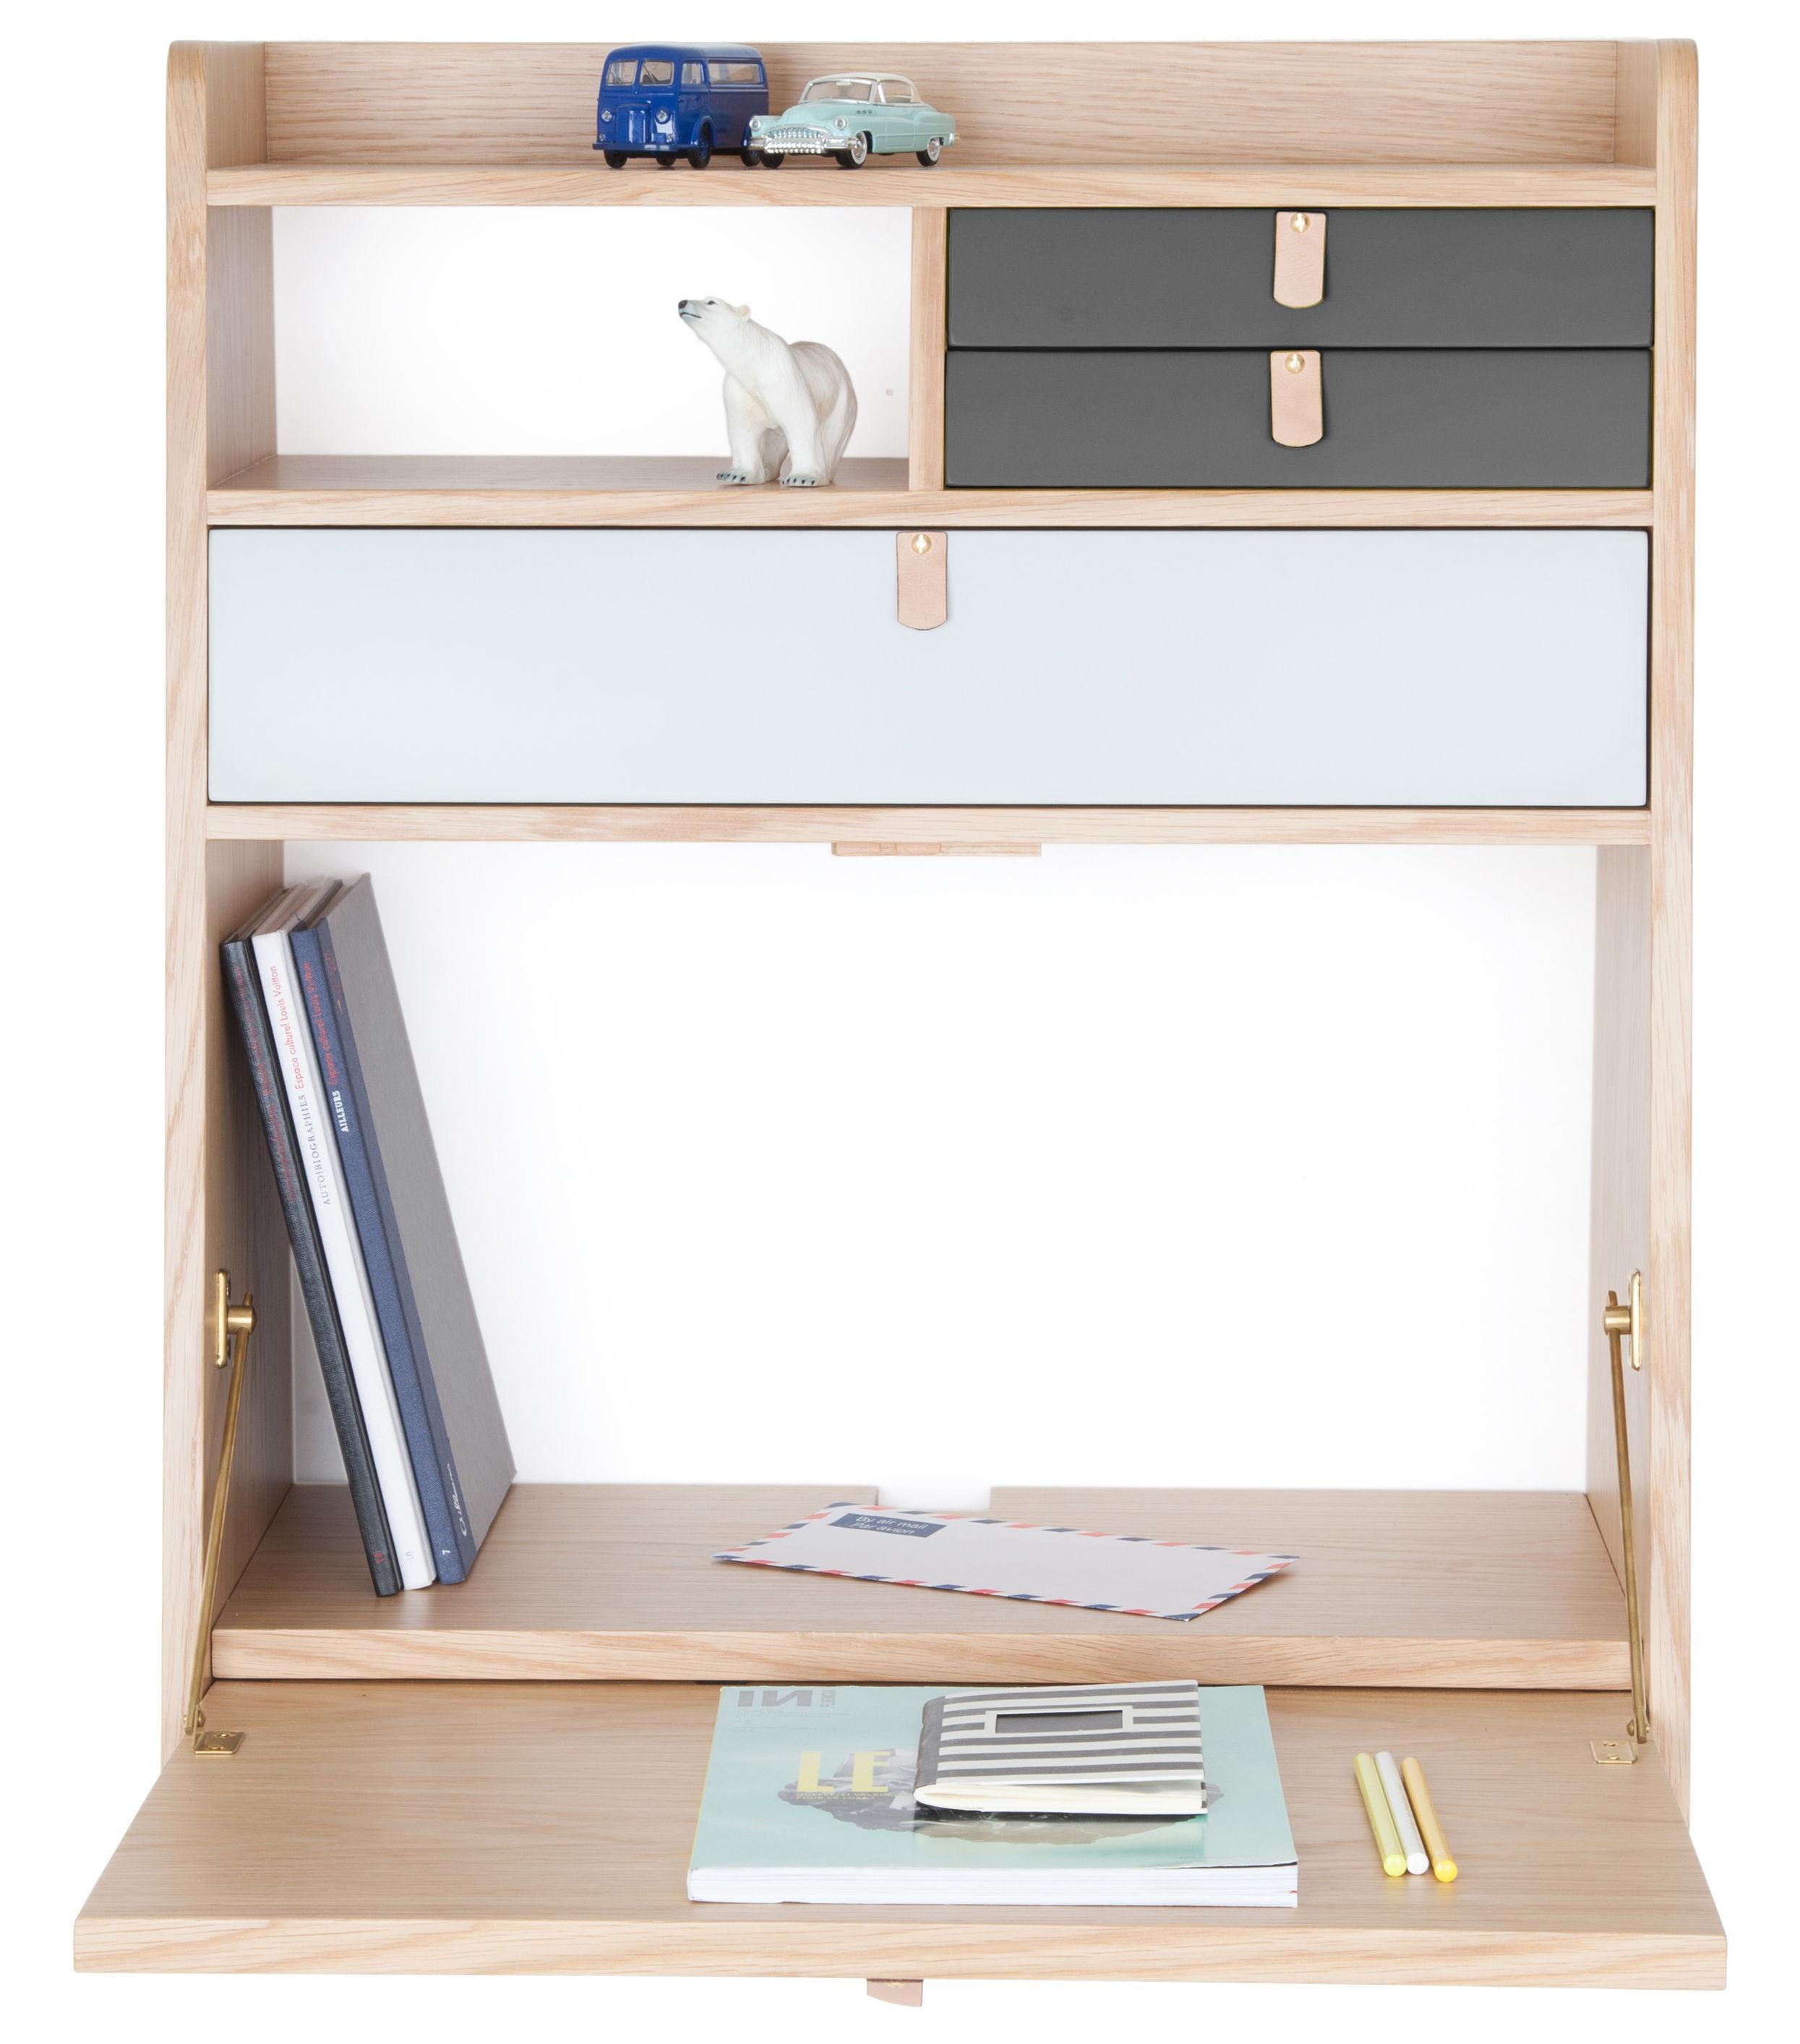 Furniture - Kids Furniture - Gaston Wall writing desk by Hartô - Dark grey & light grey - Leather, MDF veneer oak